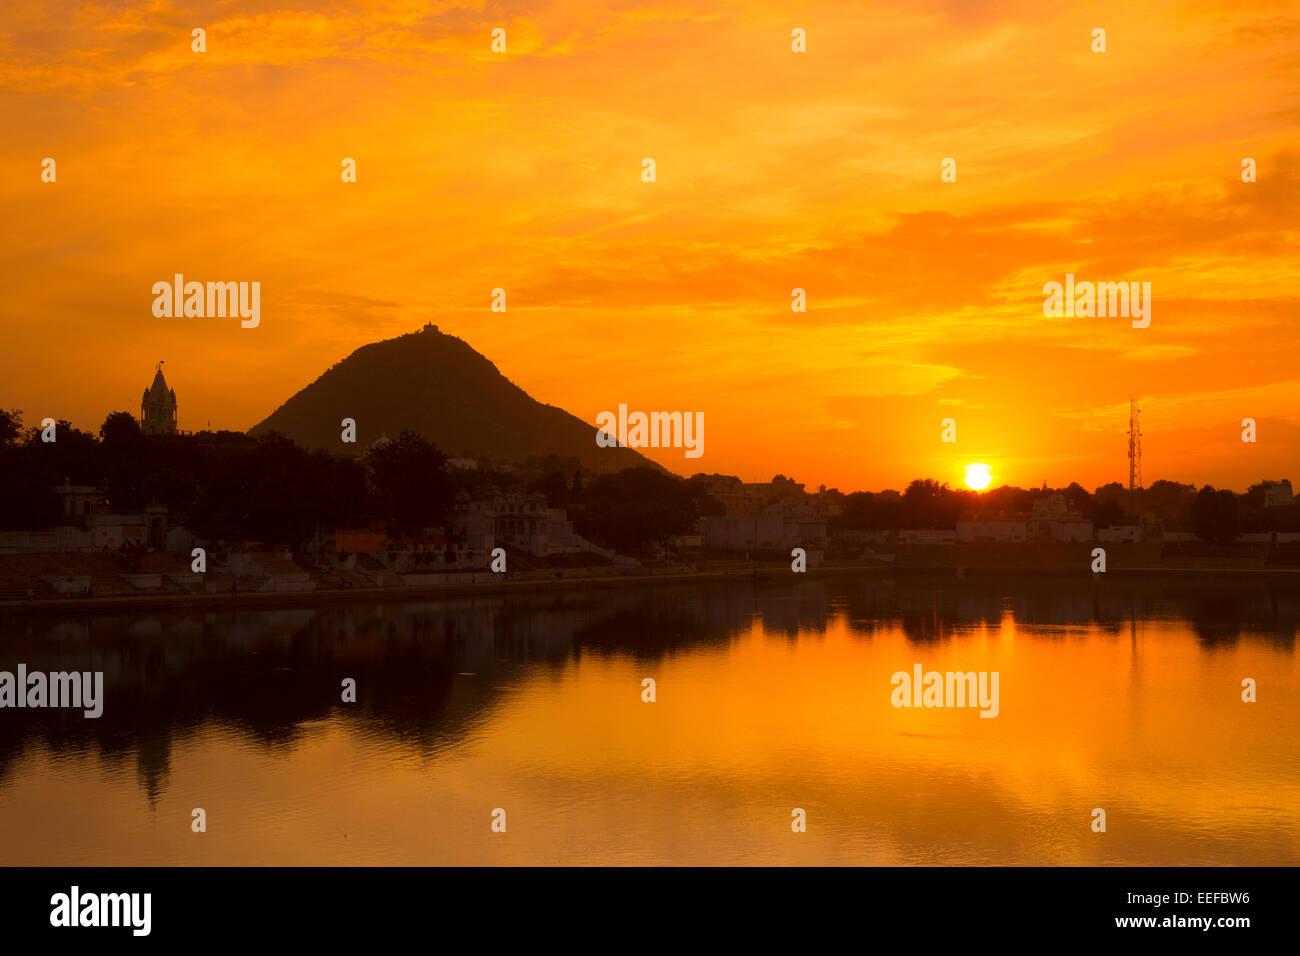 India, Rajasthan, Pushkar at sunset - Stock Image